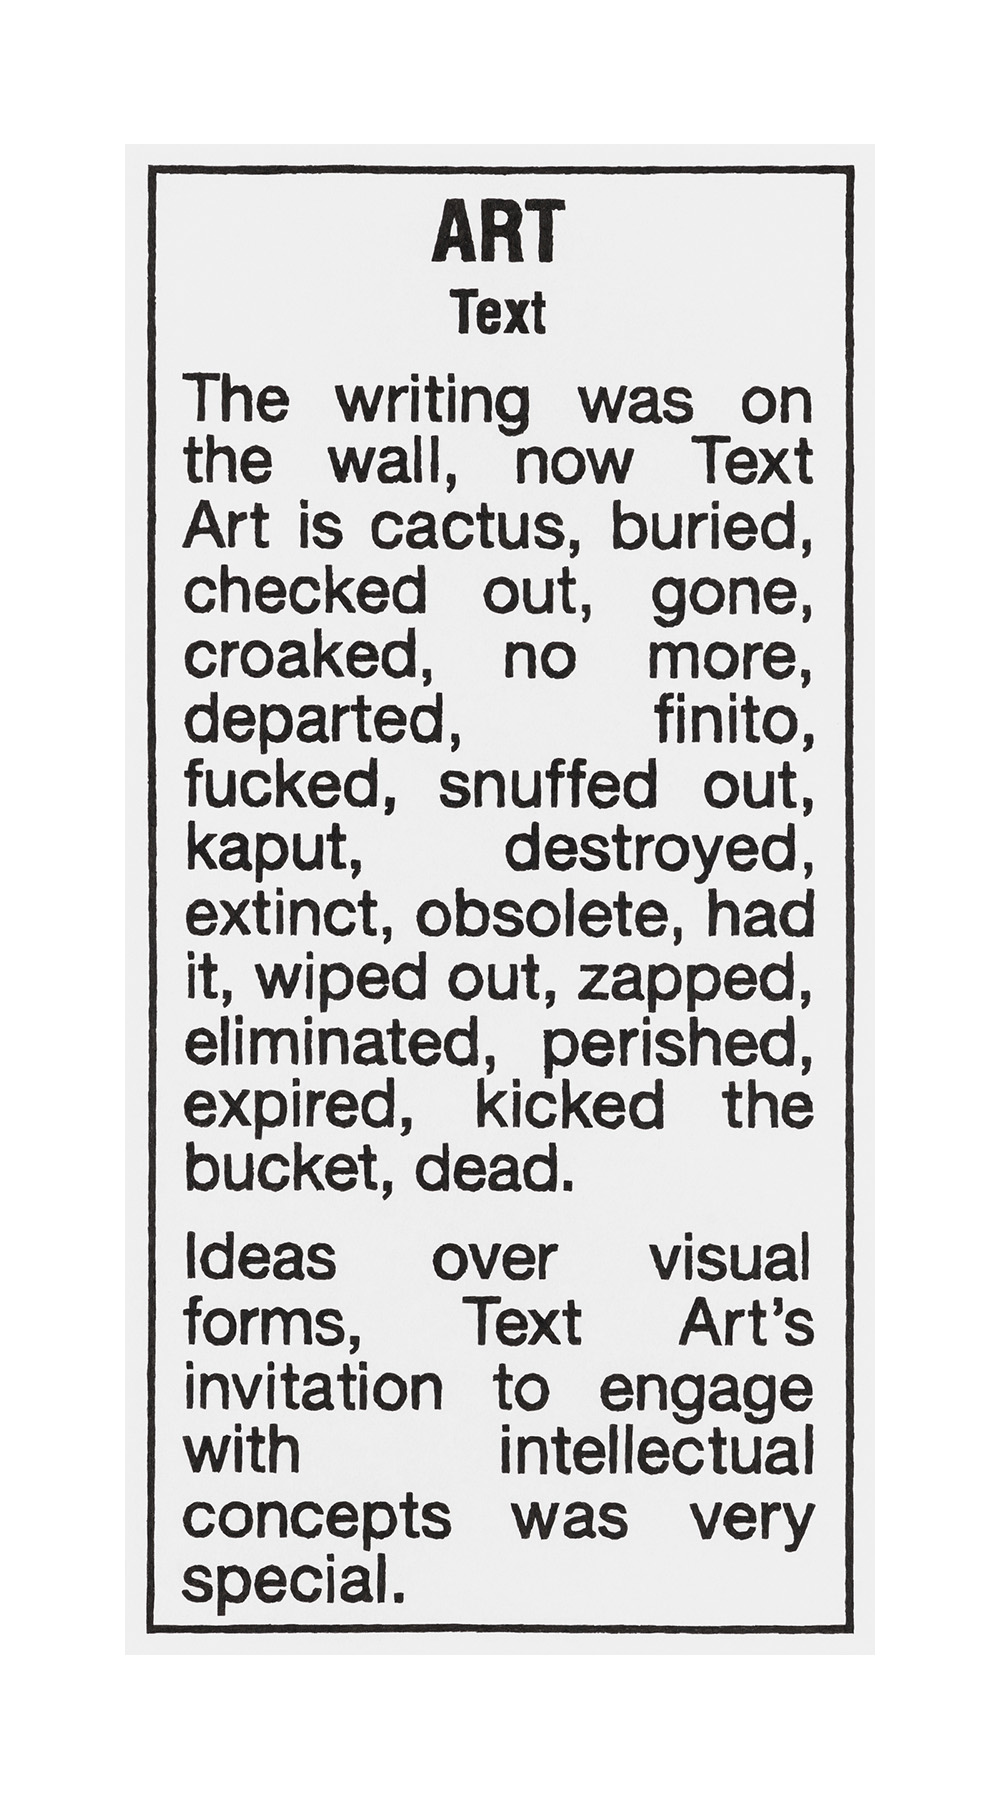 ART, Text 2018